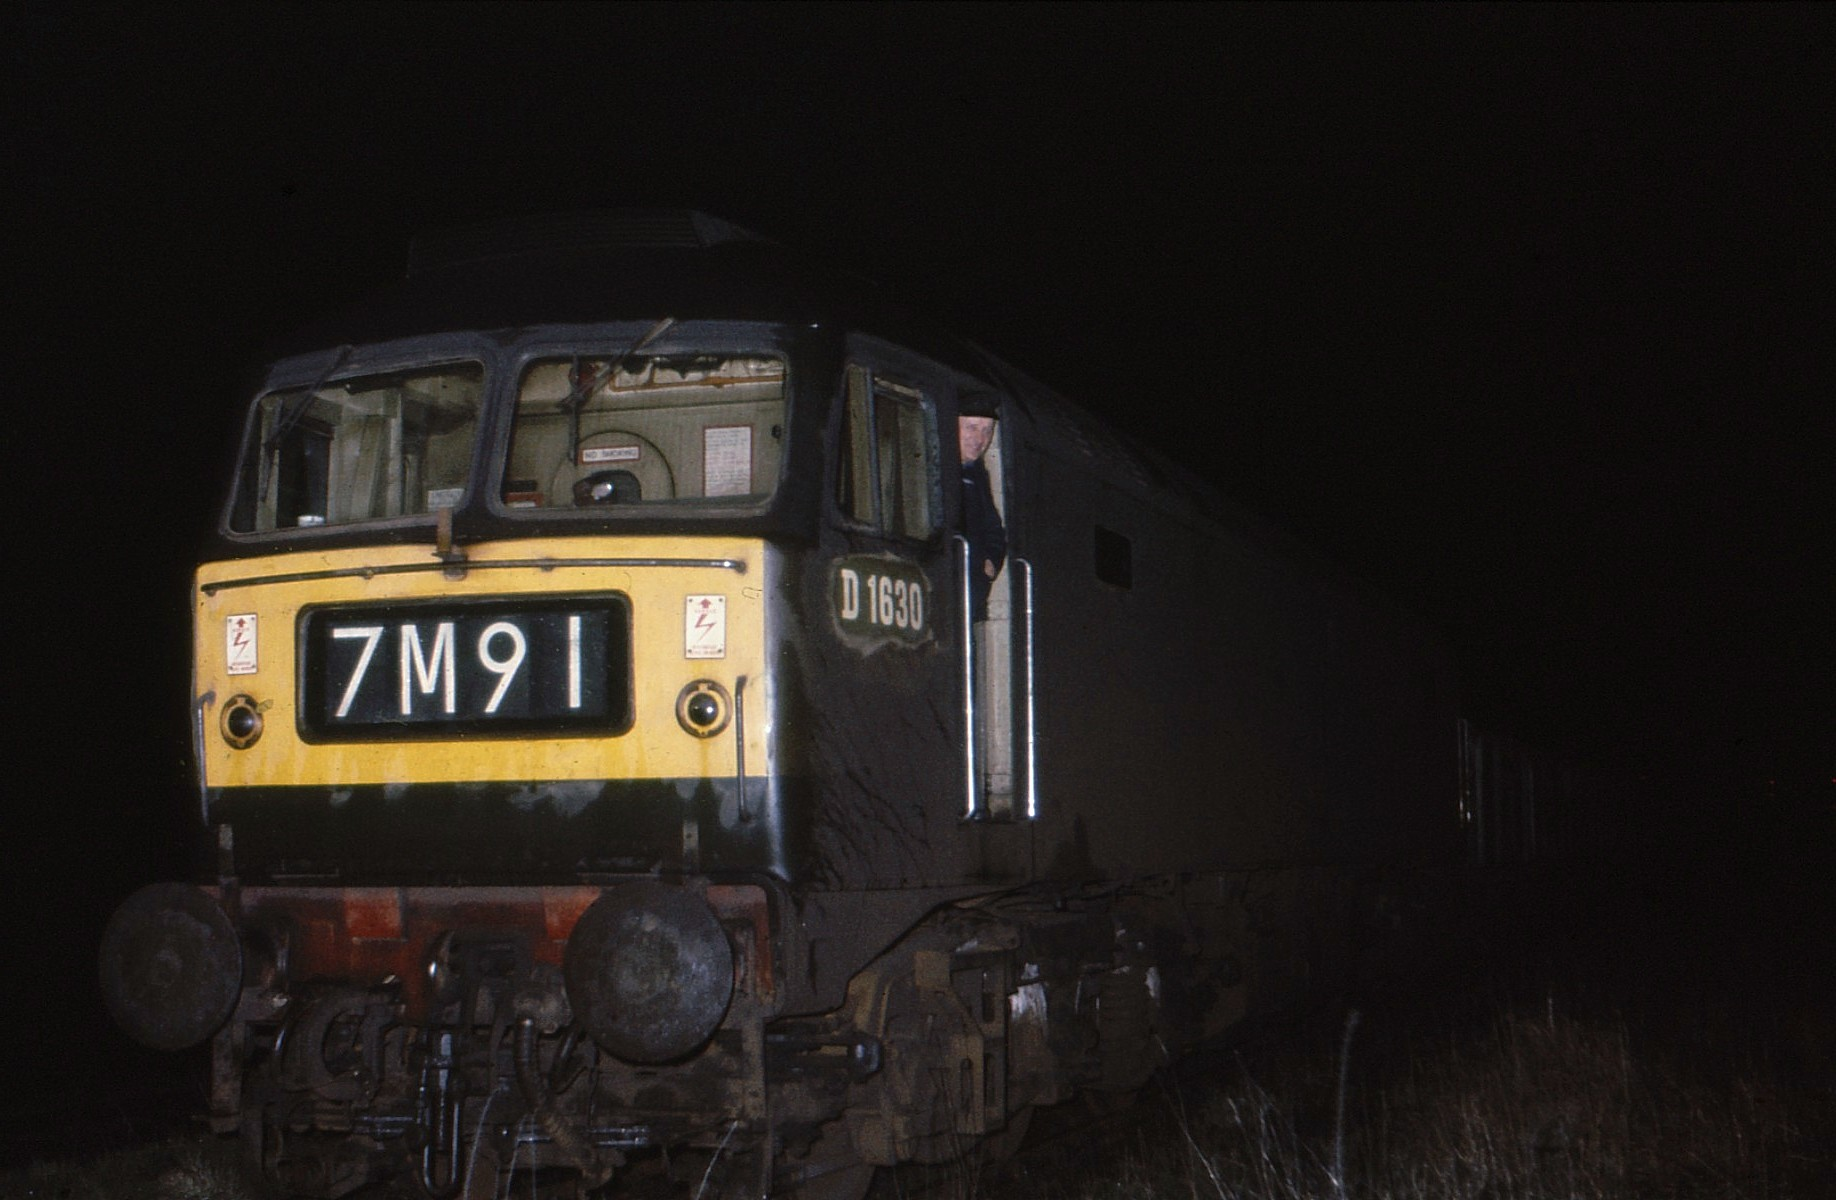 Train reporting number - Wikipedia